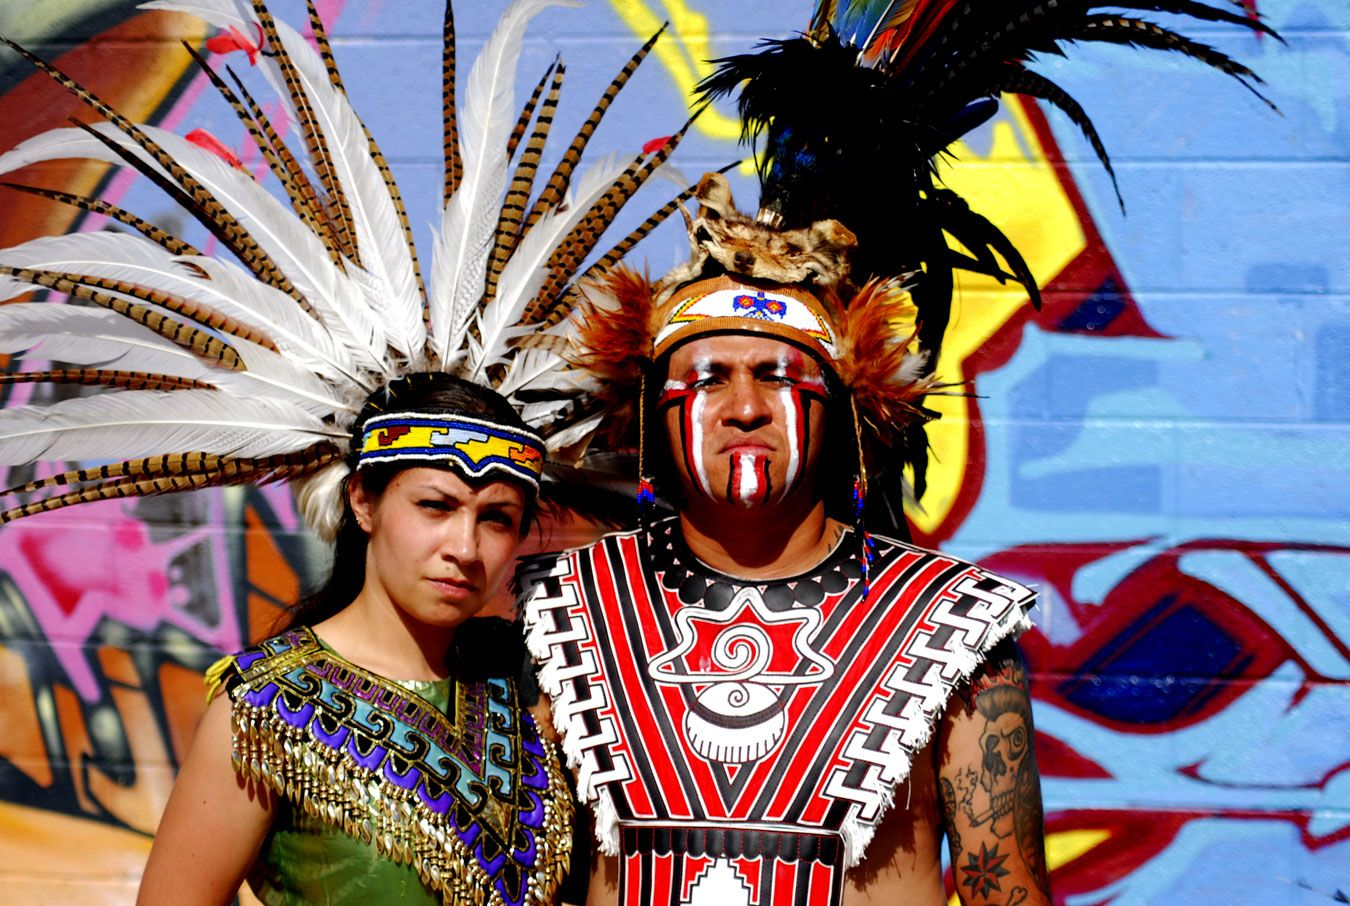 него вроде племя майя фото картинки комодов